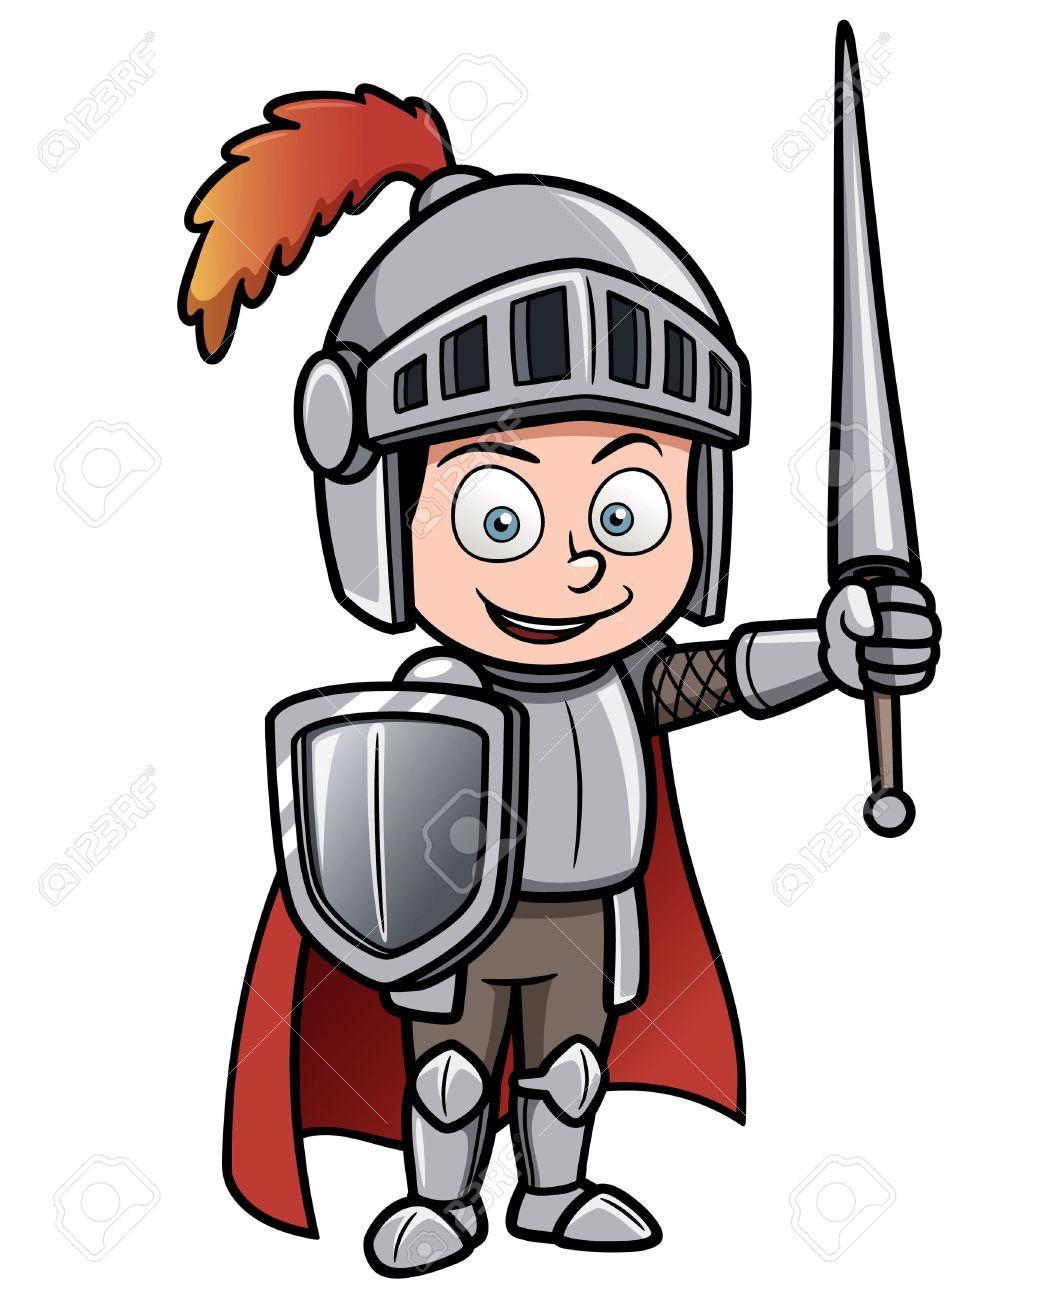 Dessin Chevalier vector illustration de chevalier de dessin animé clip art libres de